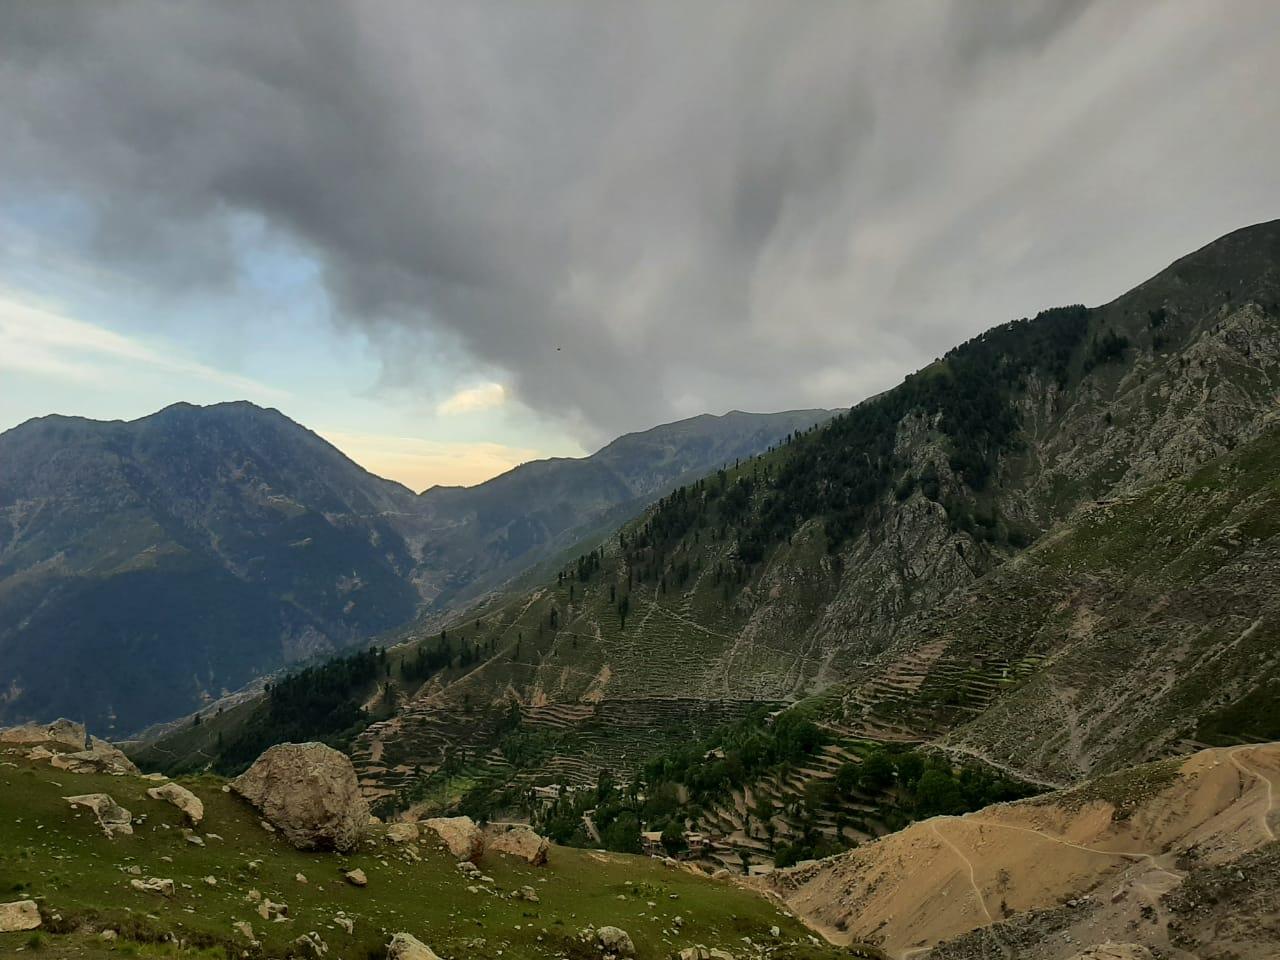 Kachal Miskini Lower Dir